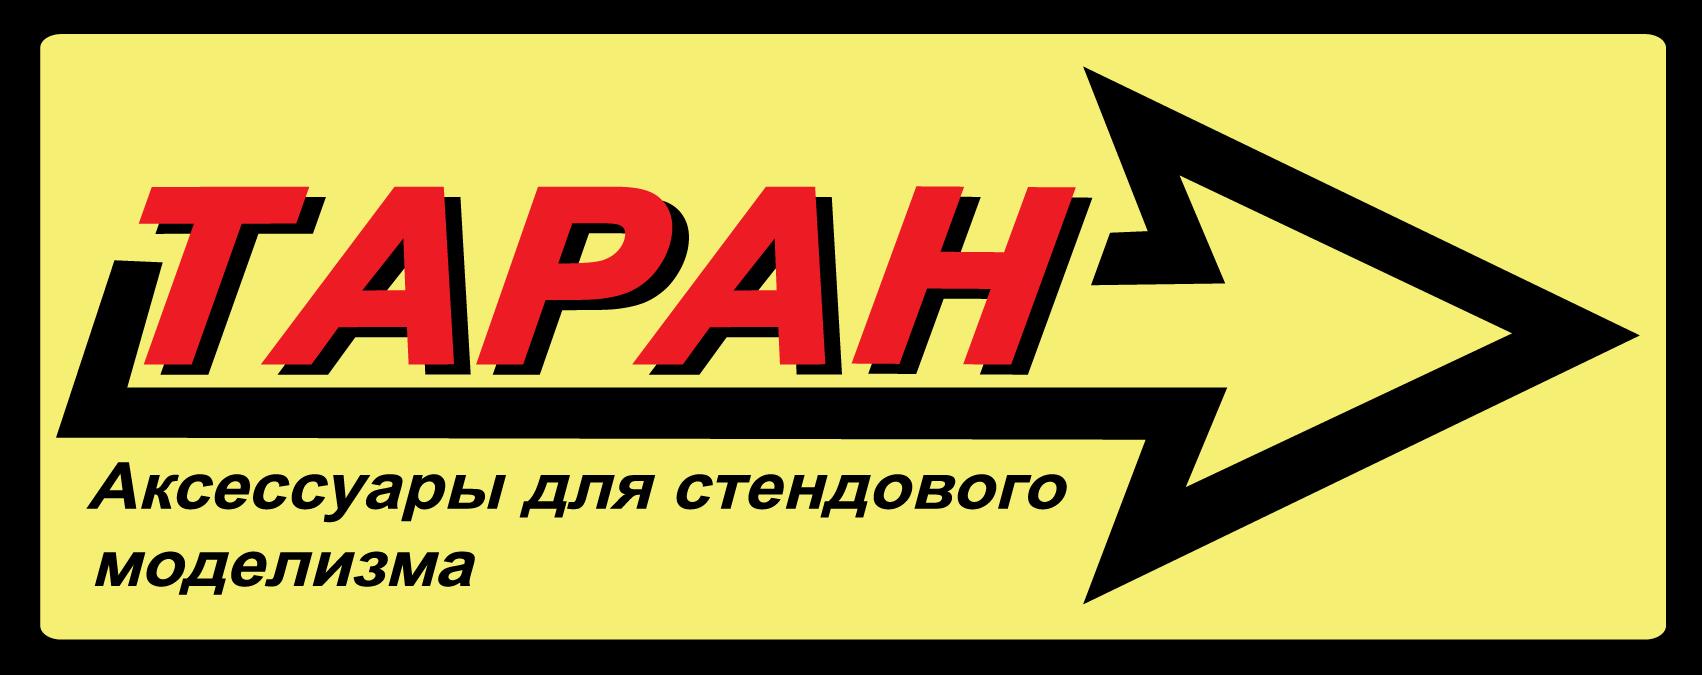 taran-logo